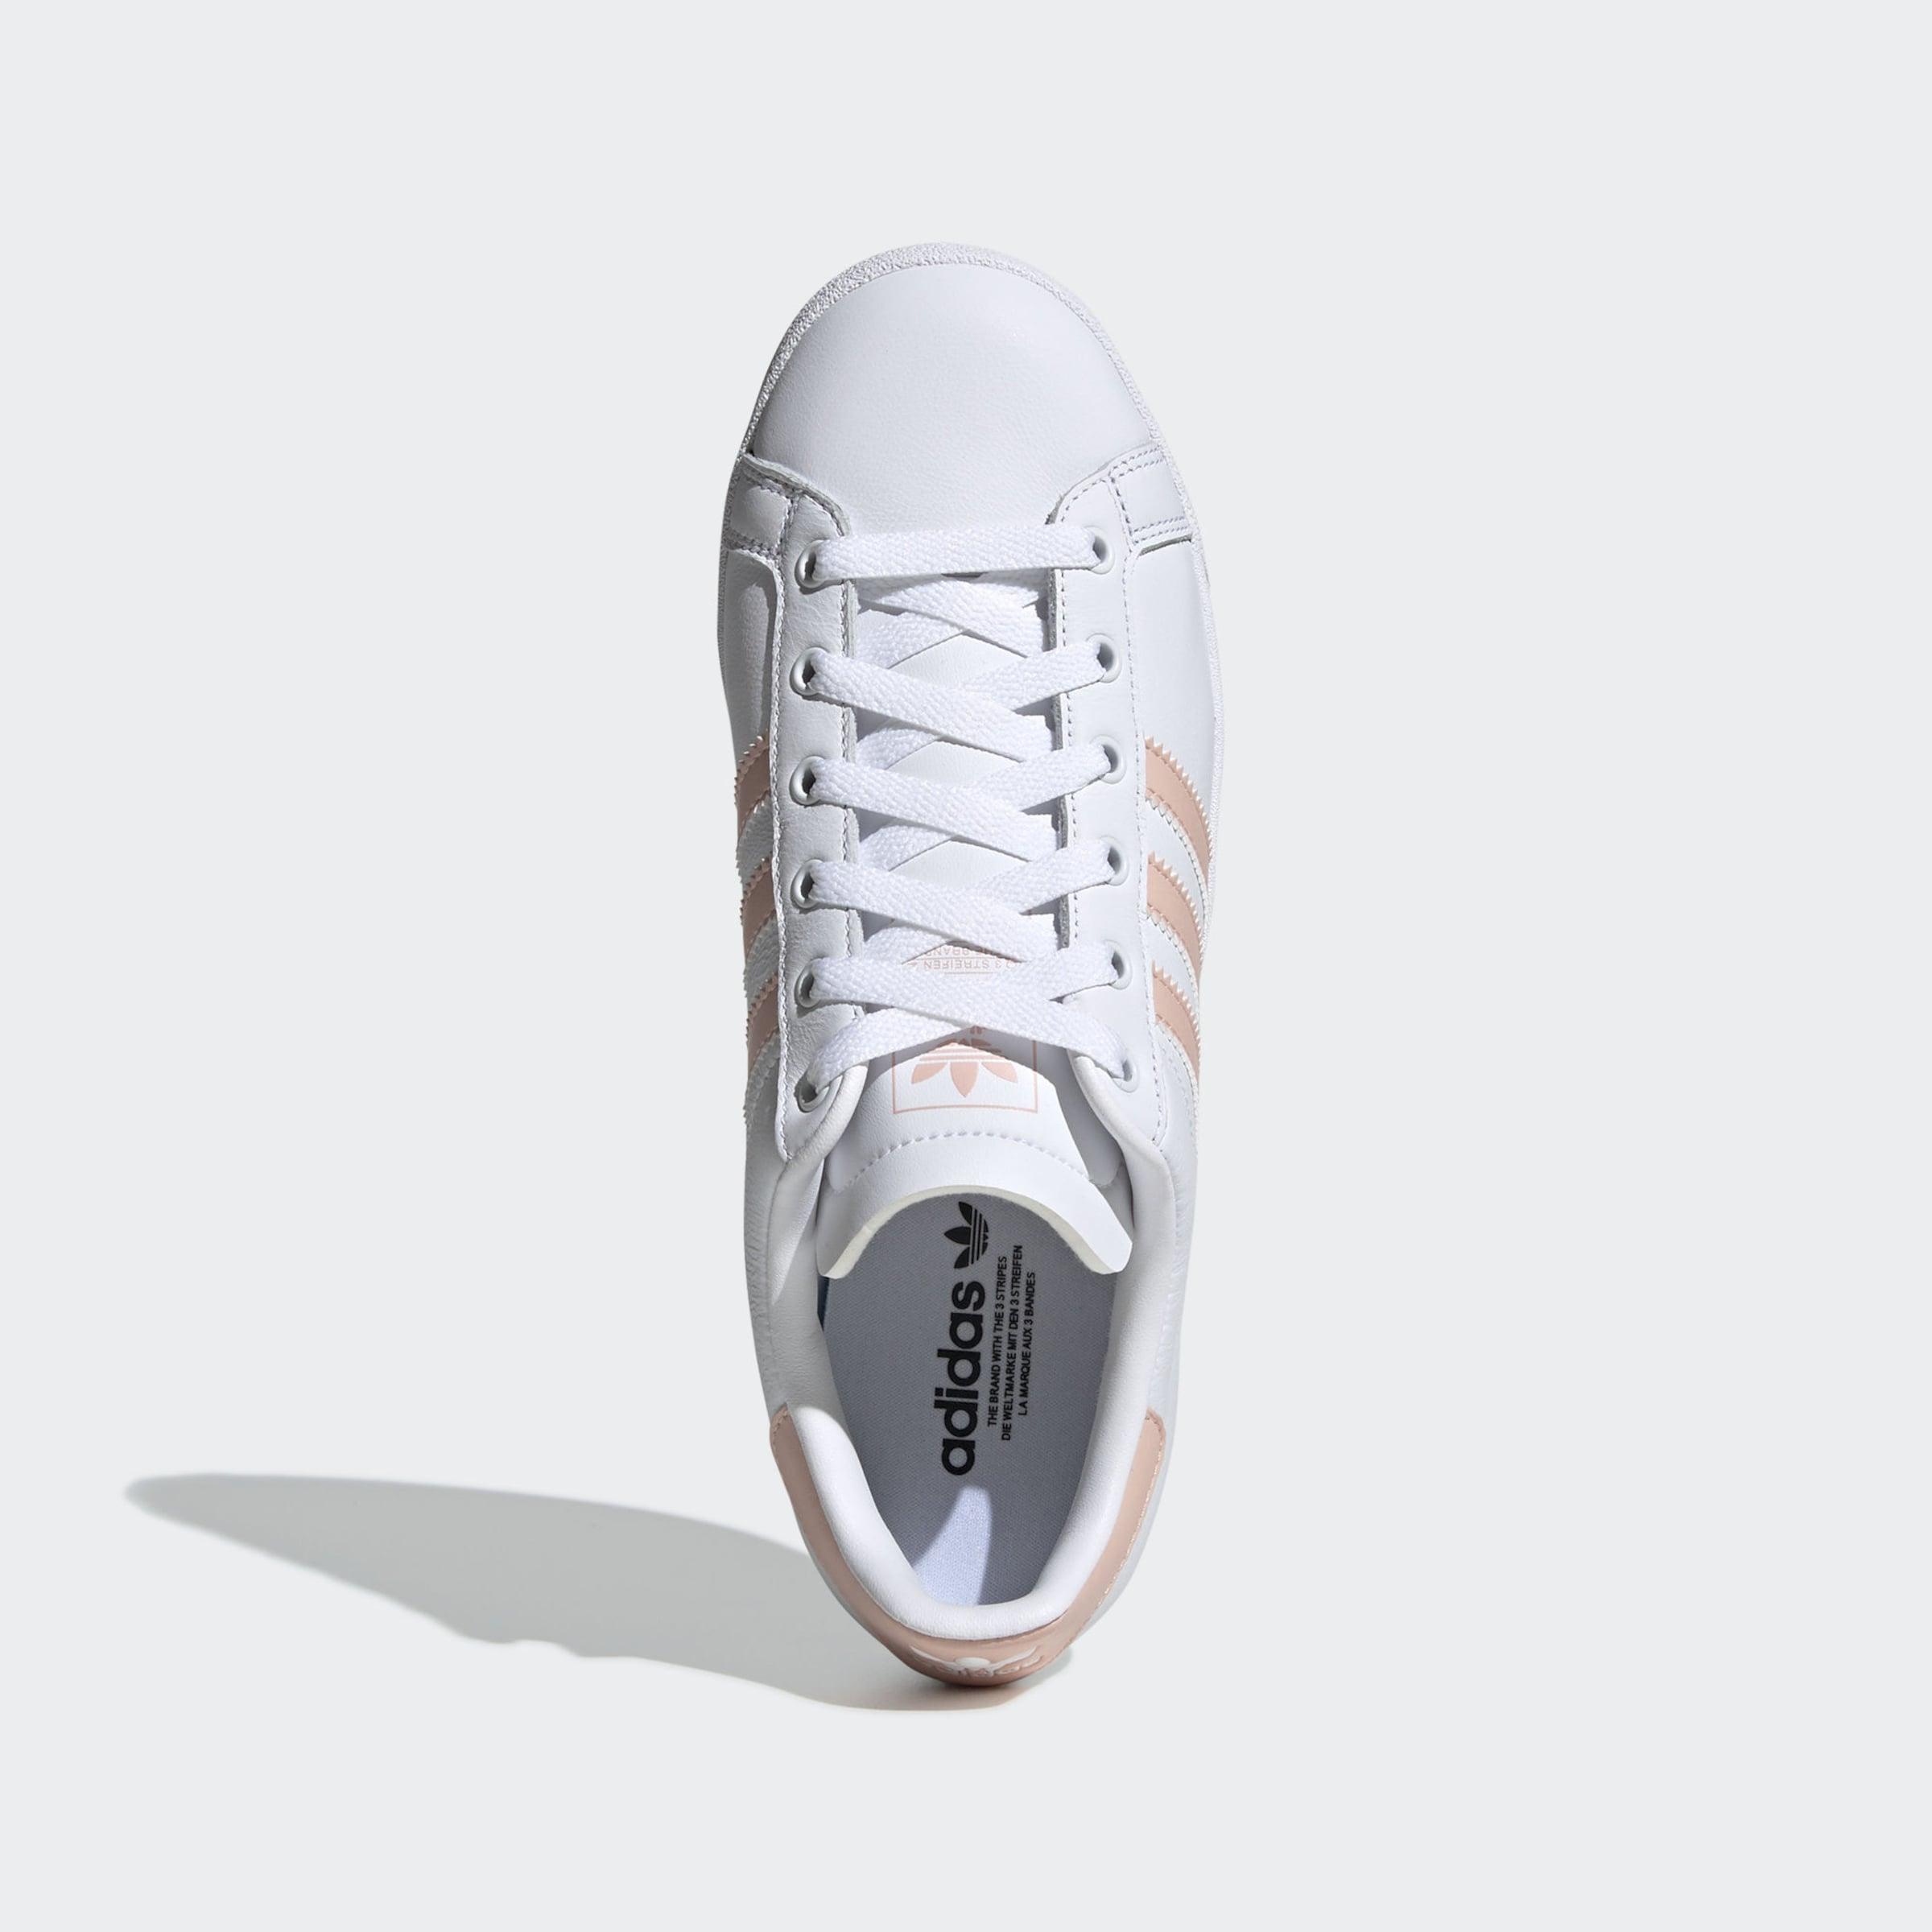 In Adidas Schuh Star' 'coast Originals PuderWeiß VqUpSzMG